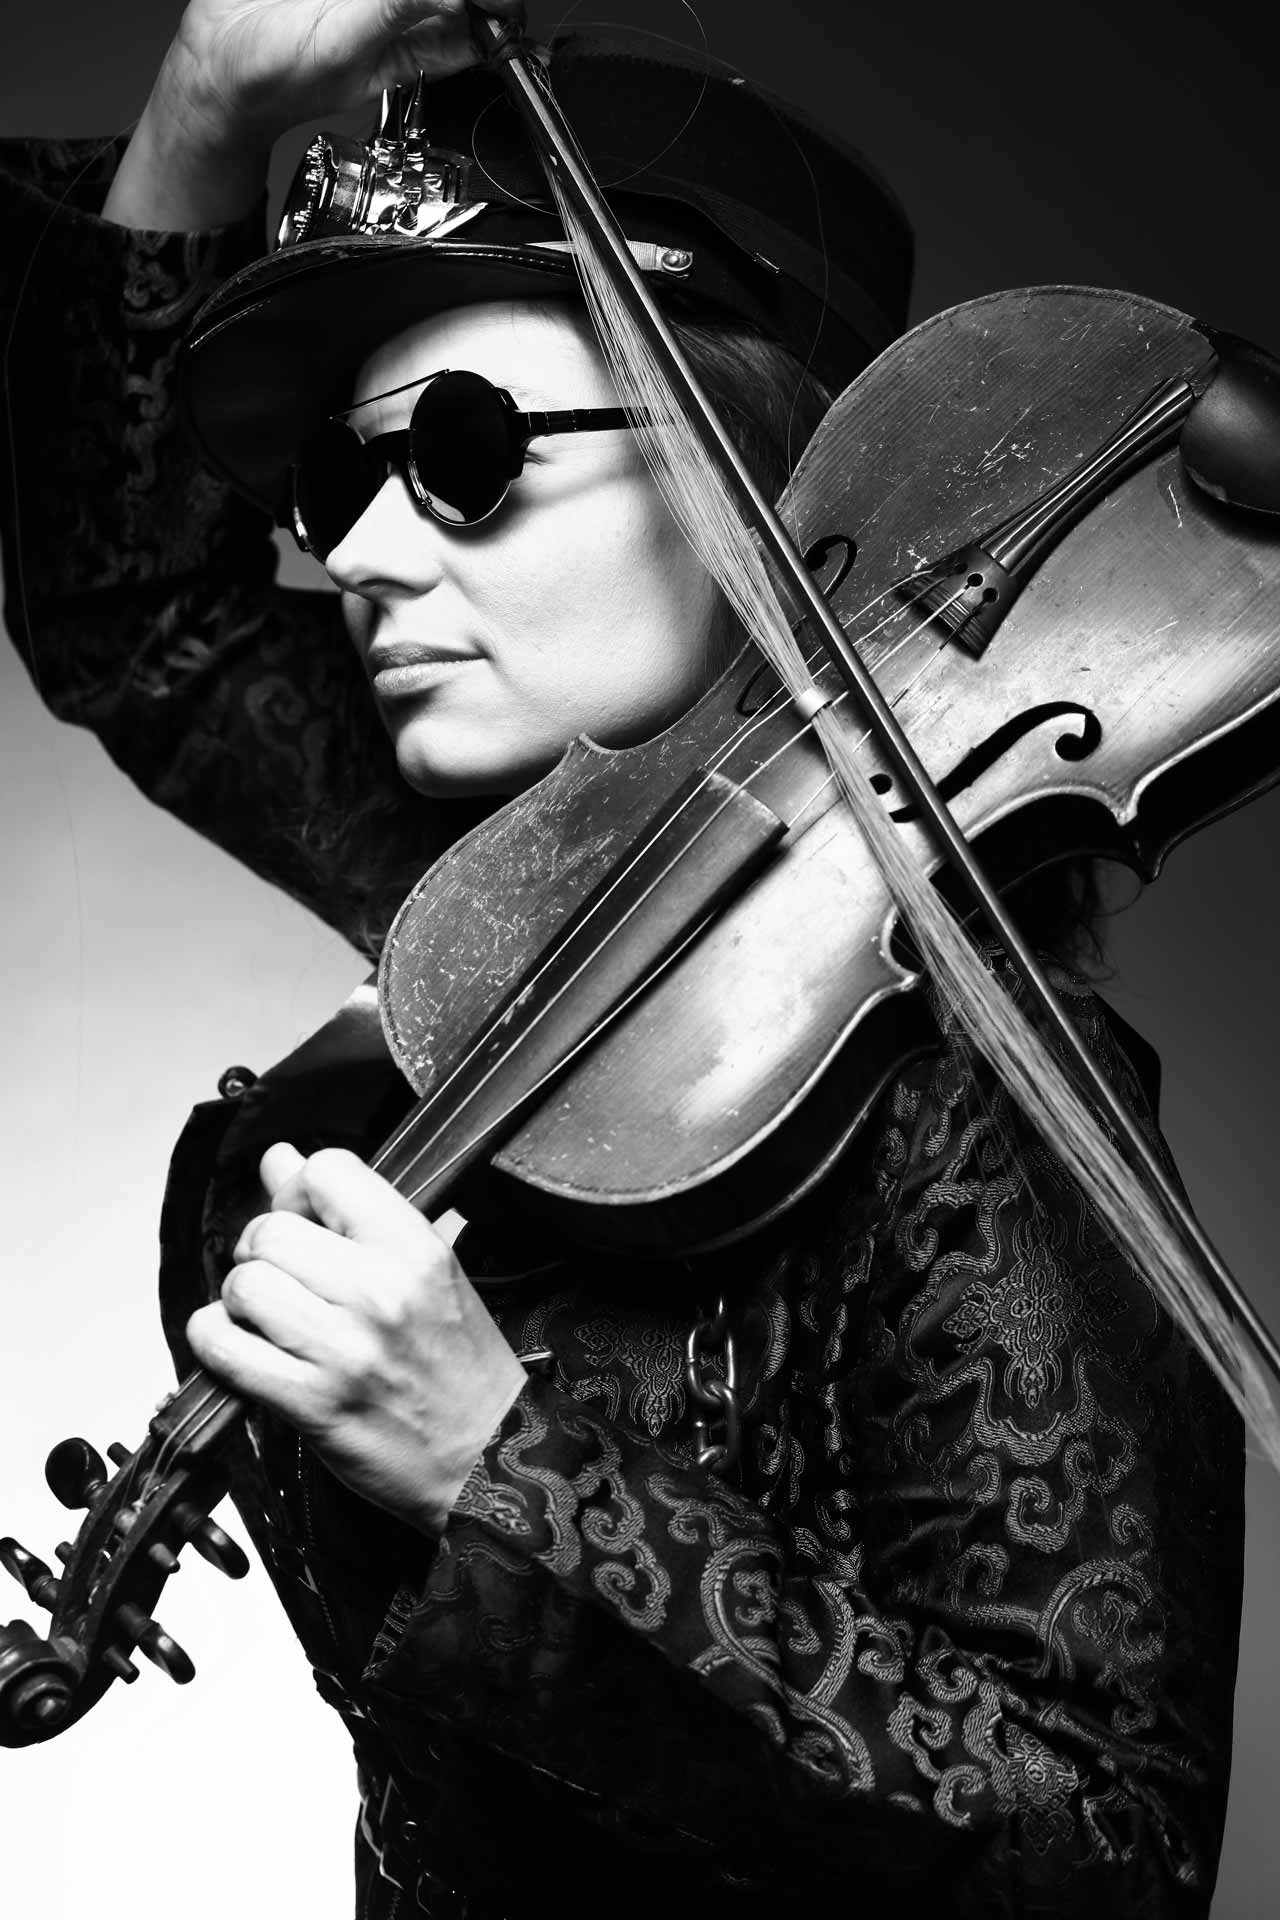 Yvonne Orwat